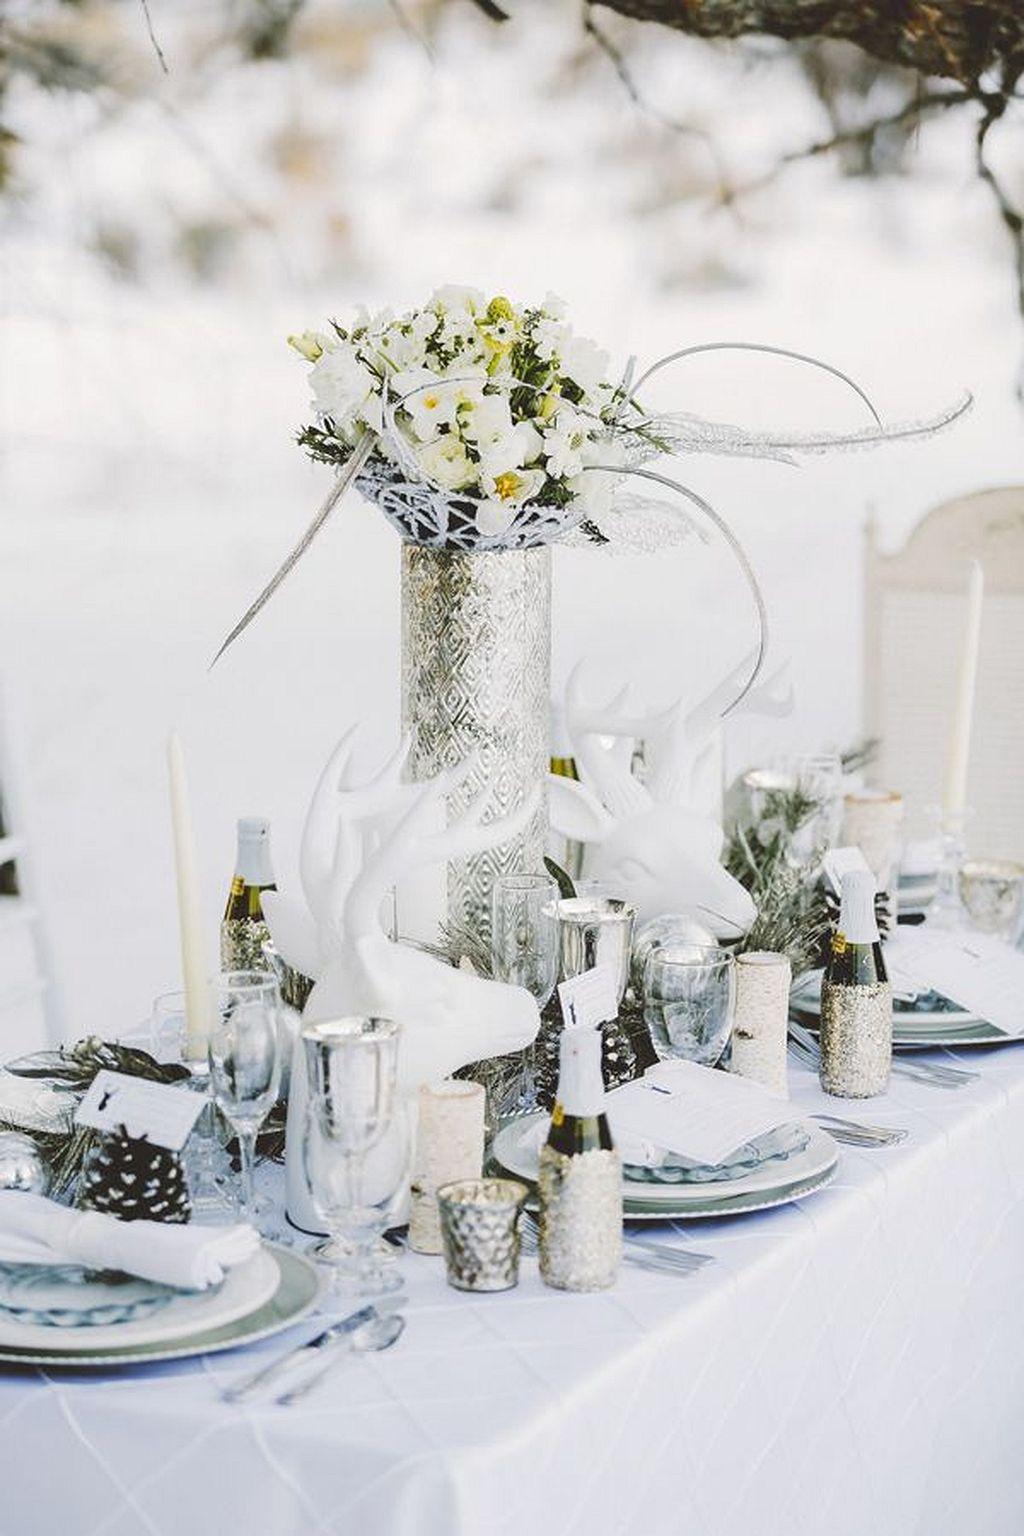 40+ Awesome Alice in Worderland Wedding Theme Ideas | Theme ideas ...